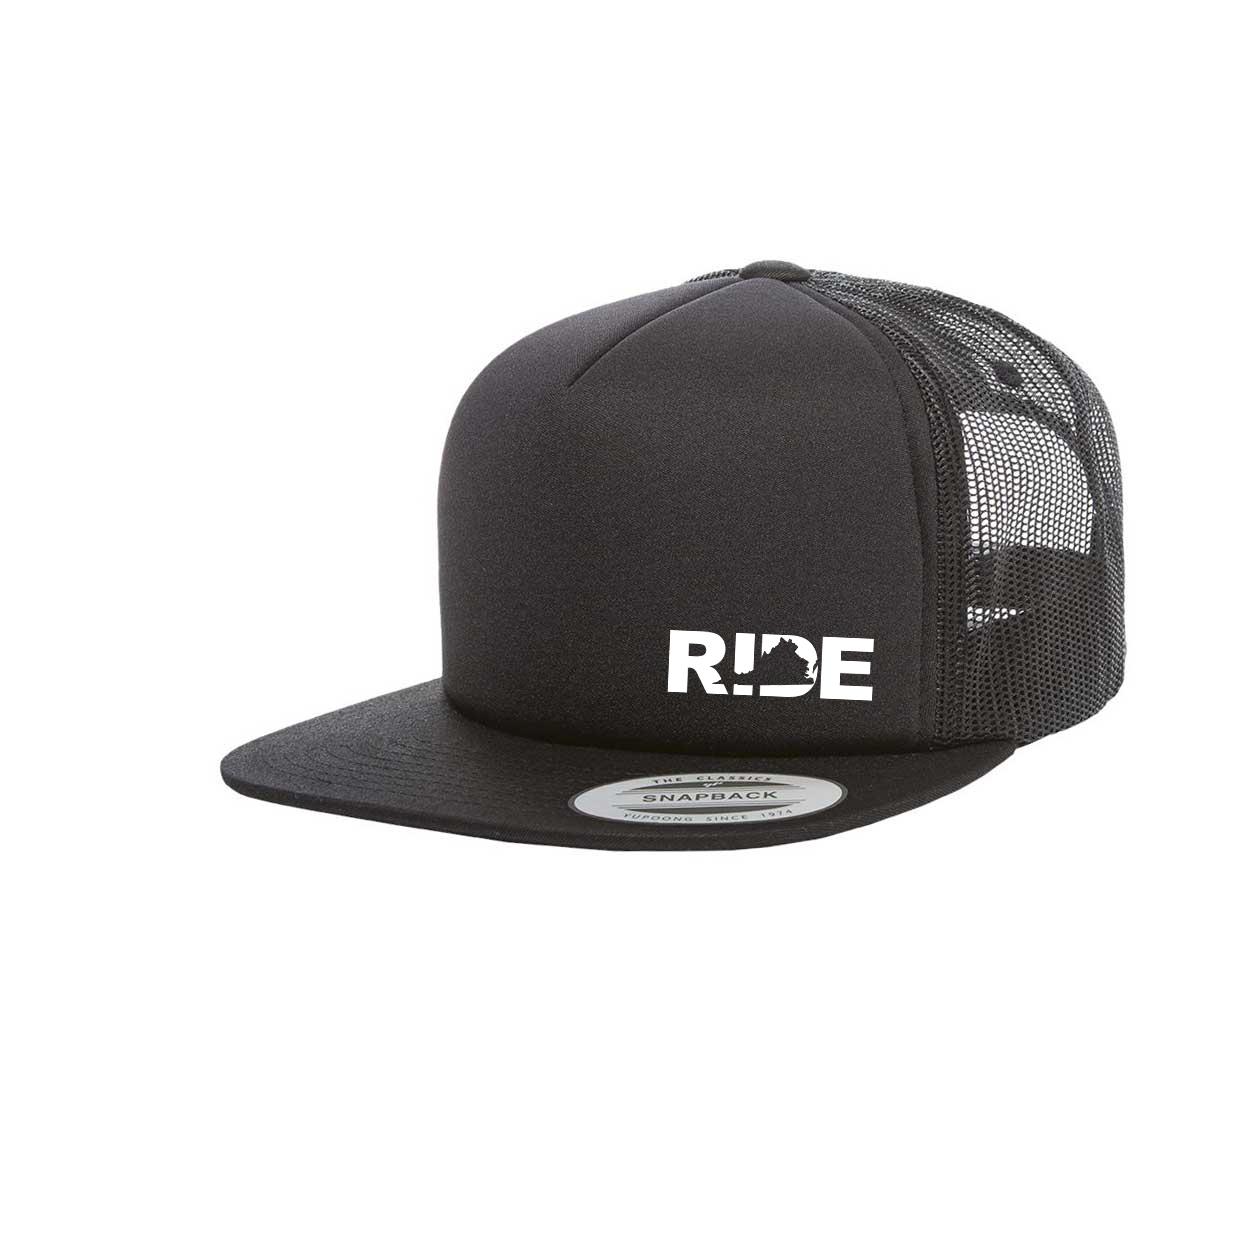 Ride Virginia Night Out Premium Foam Flat Brim Snapback Hat Black (White Logo)